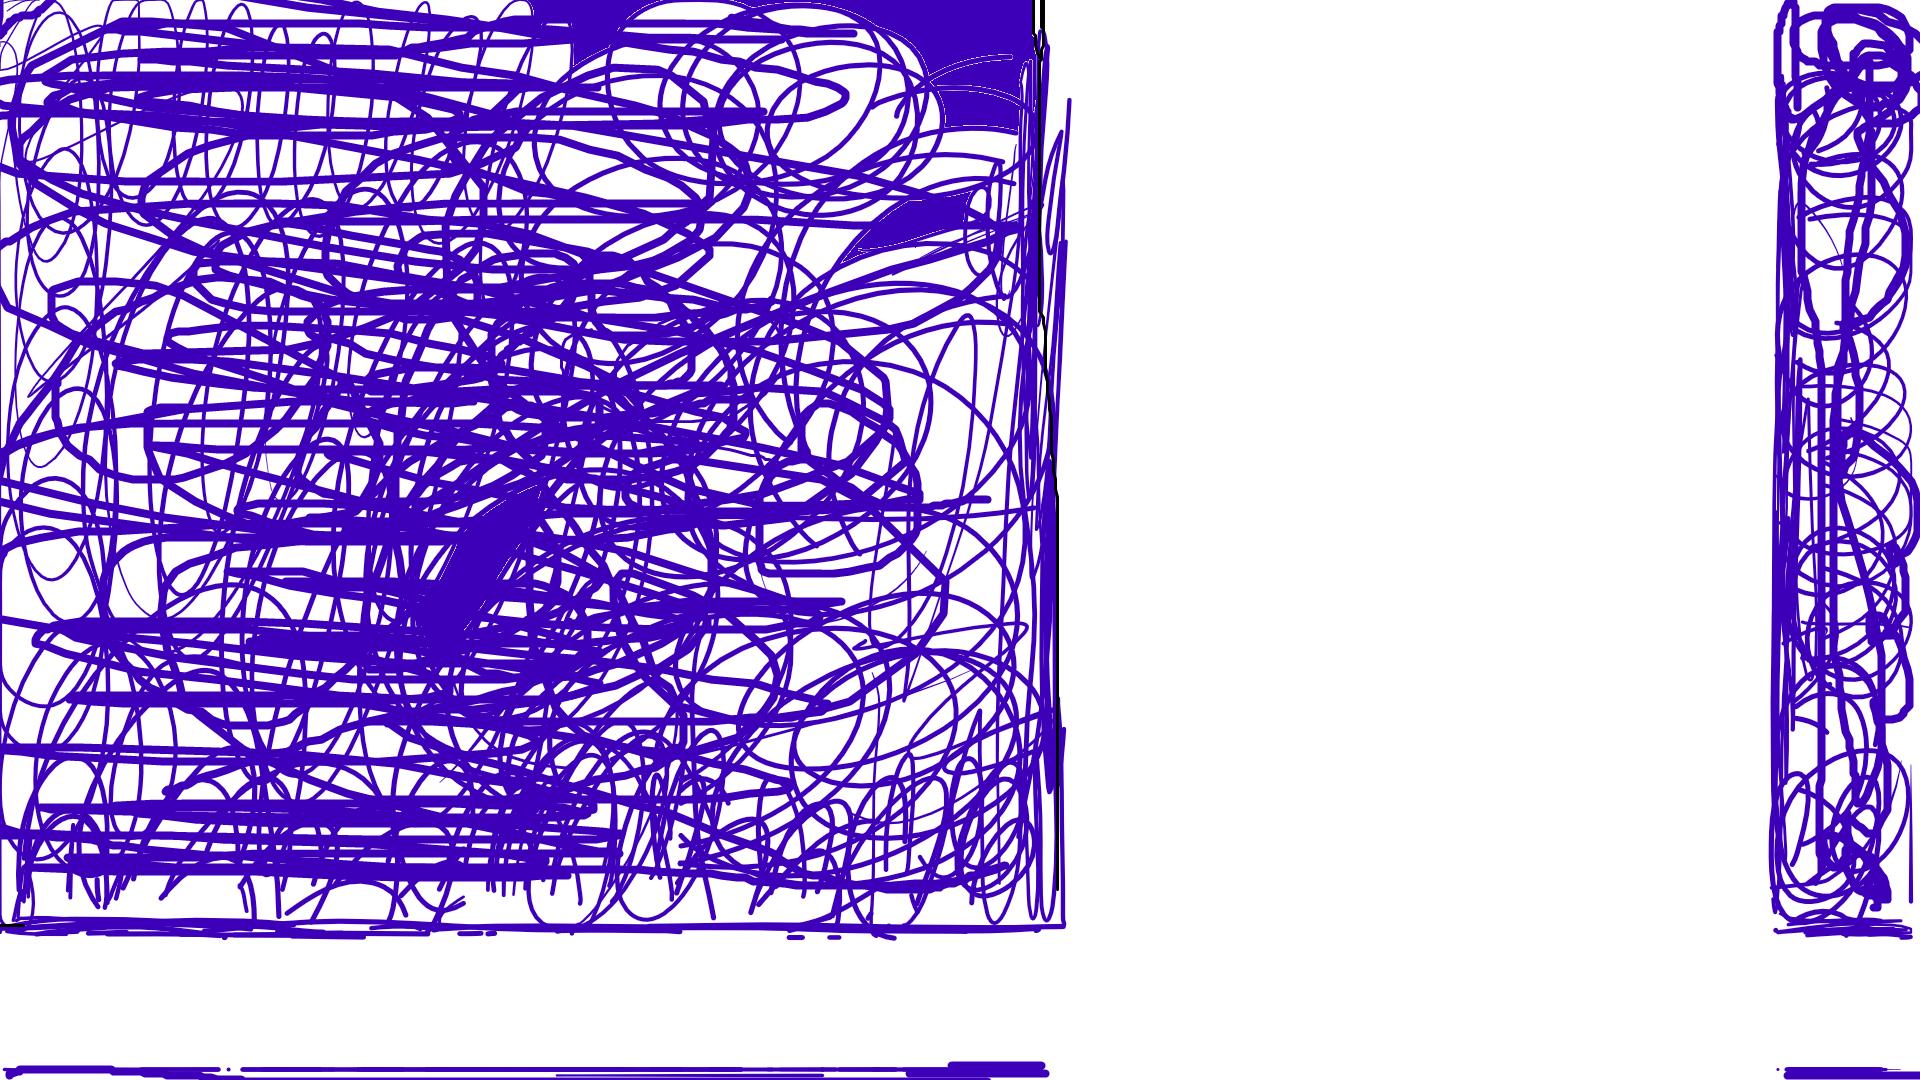 Samsung ATIV XE700T1C  -  s-Pen isn't working properly cd46e064-798f-4ed2-b540-f8d56ce12bfa?upload=true.png